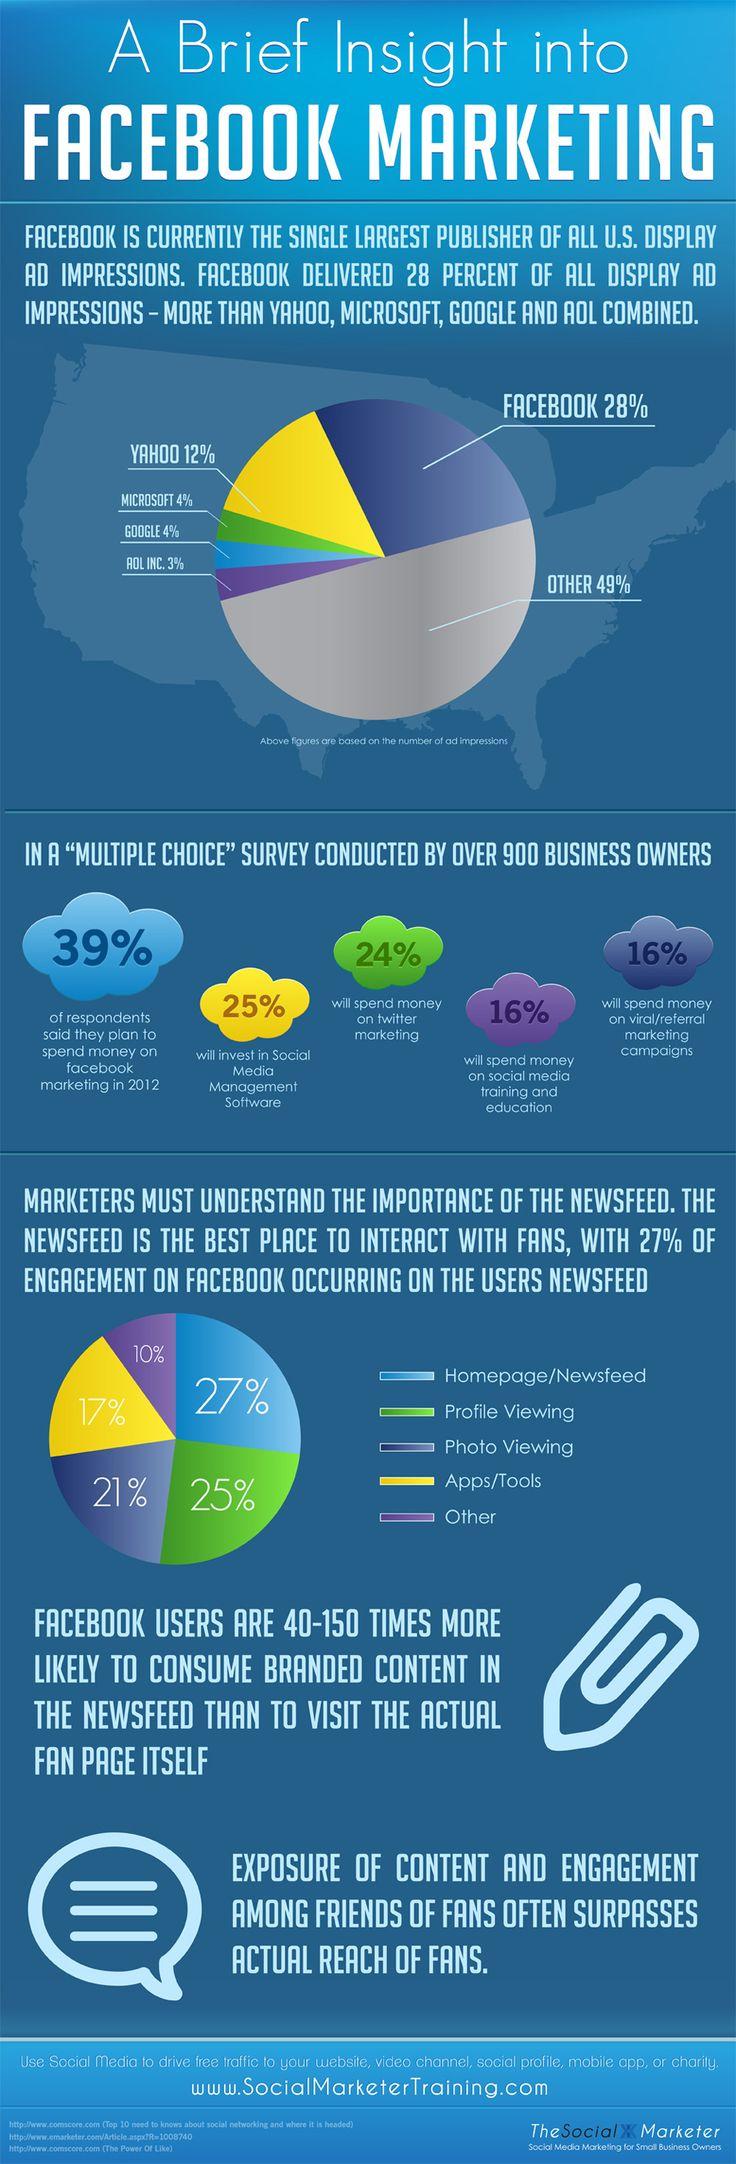 A Brief Insight to Facebook Marketing